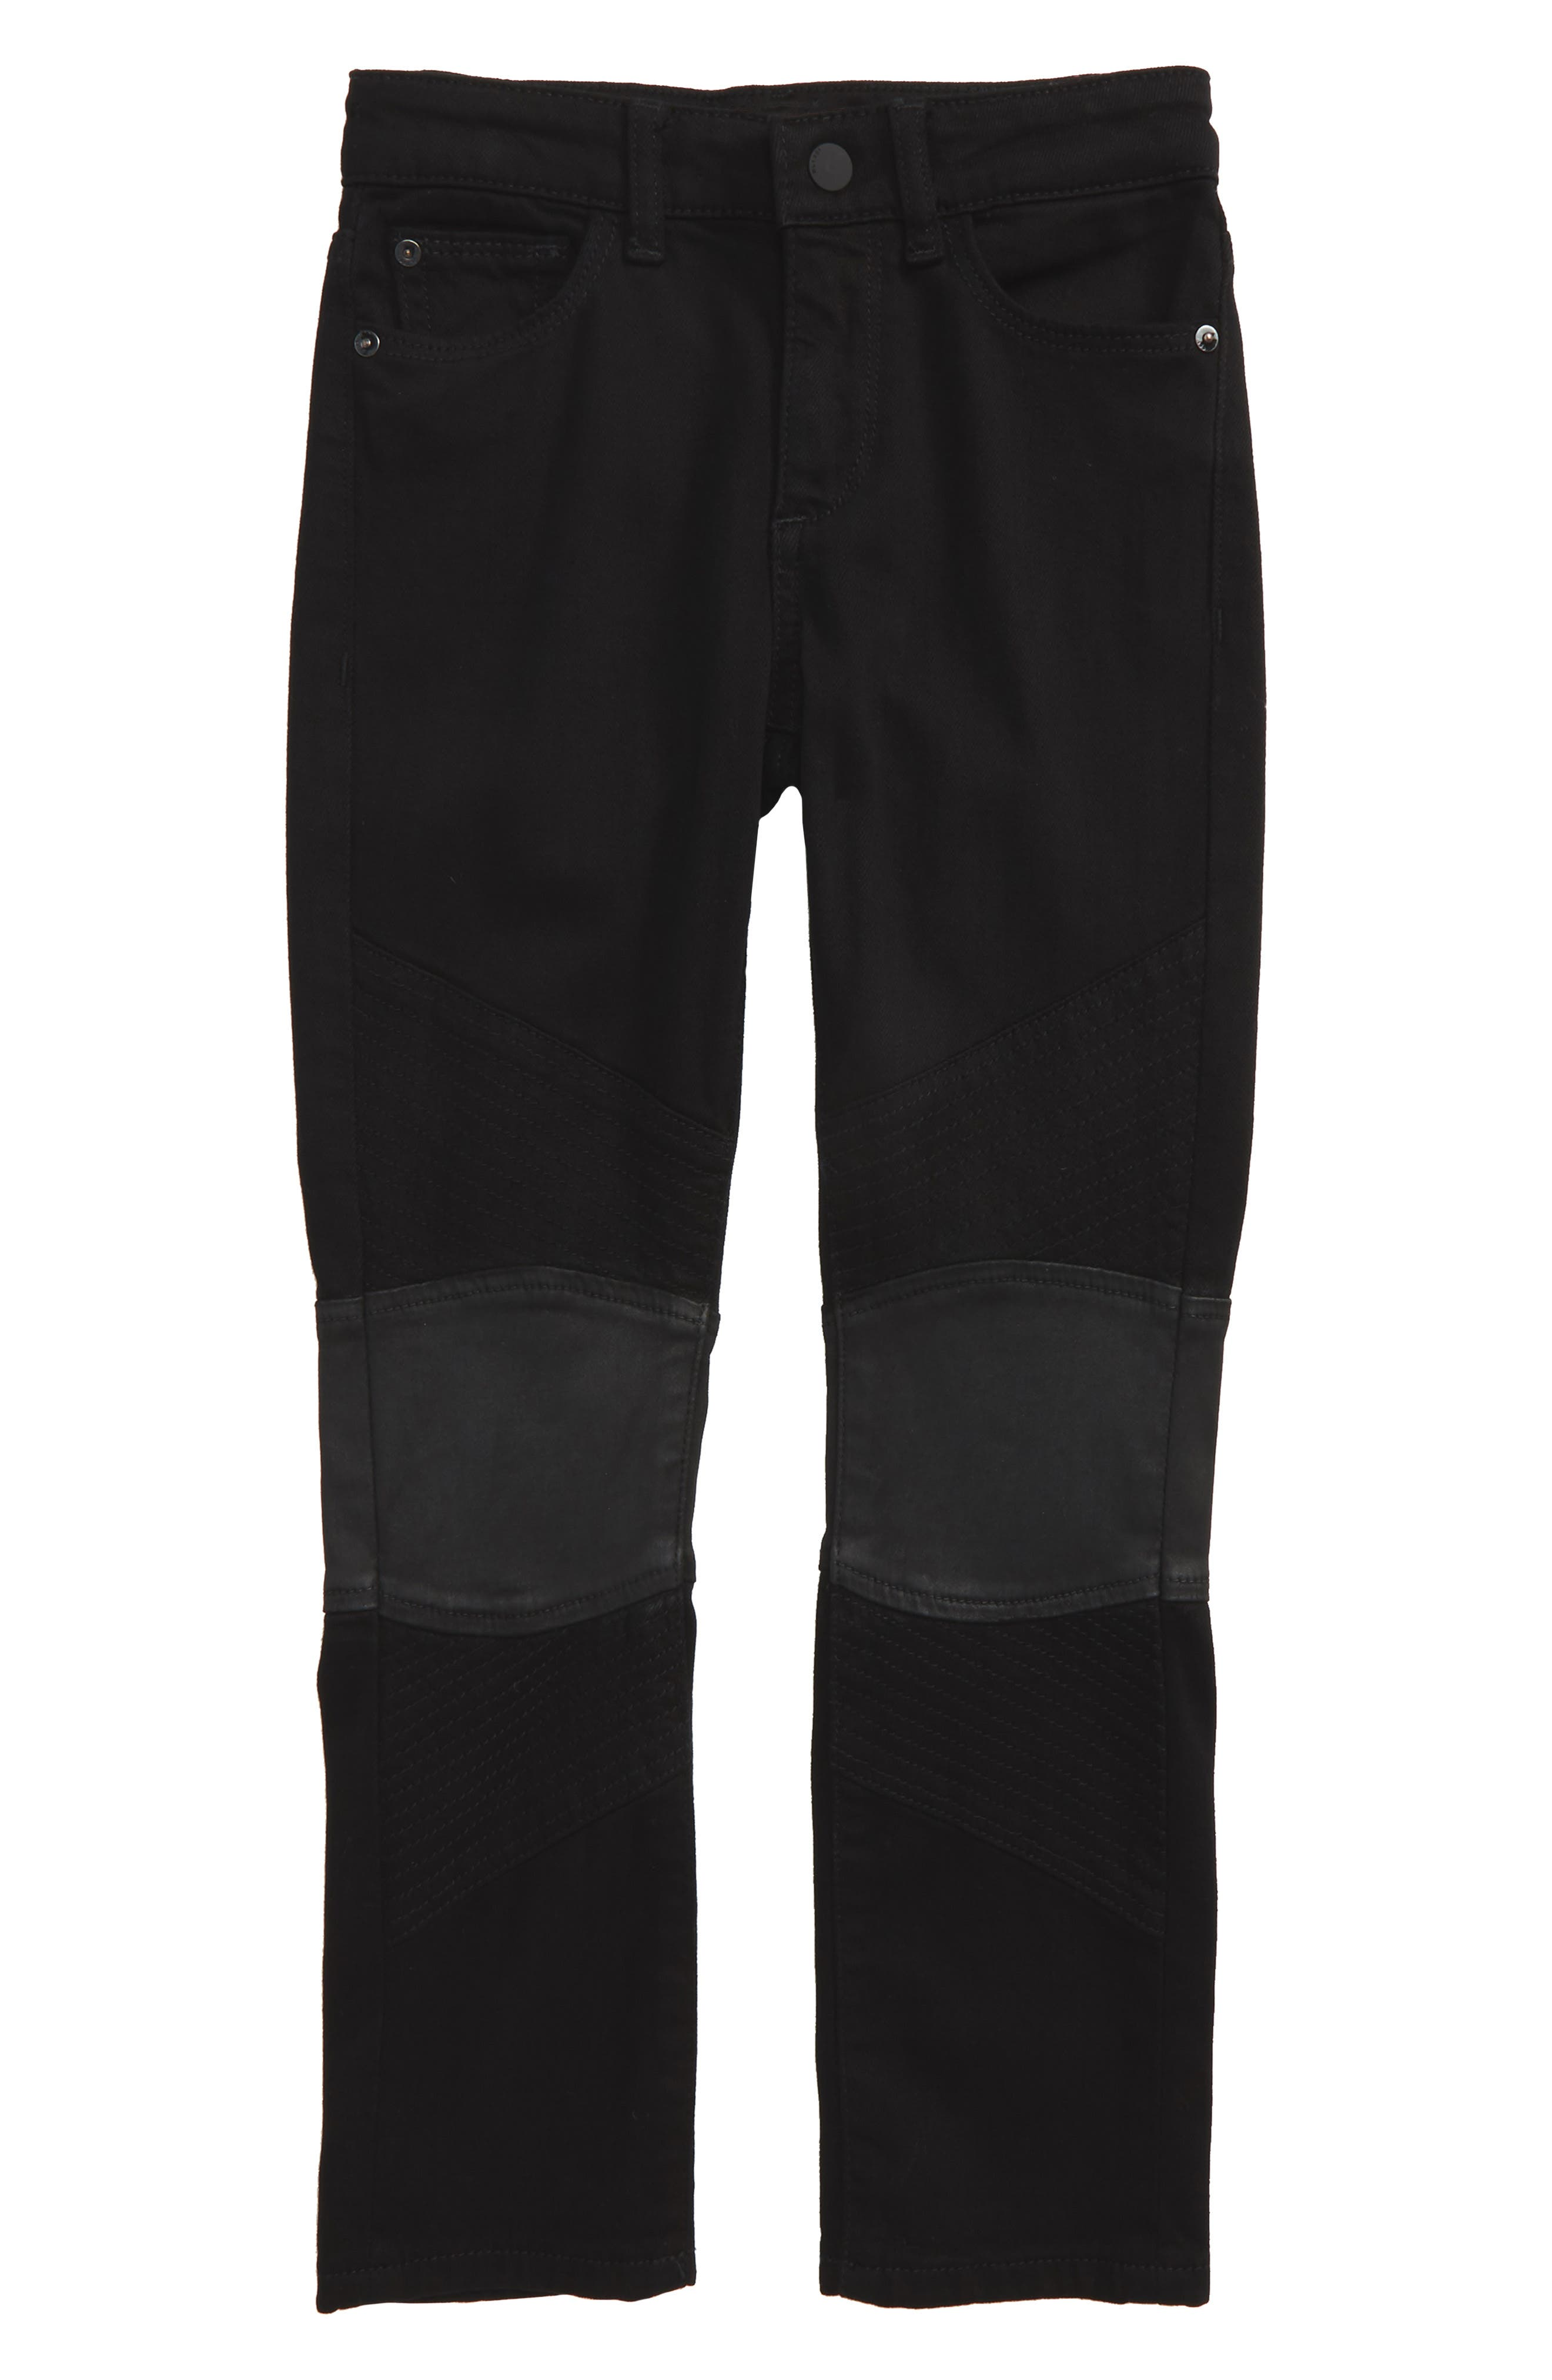 Main Image - DL1961 Hawke Skinny Moto Jeans (Toddler Boys & Little Boys)